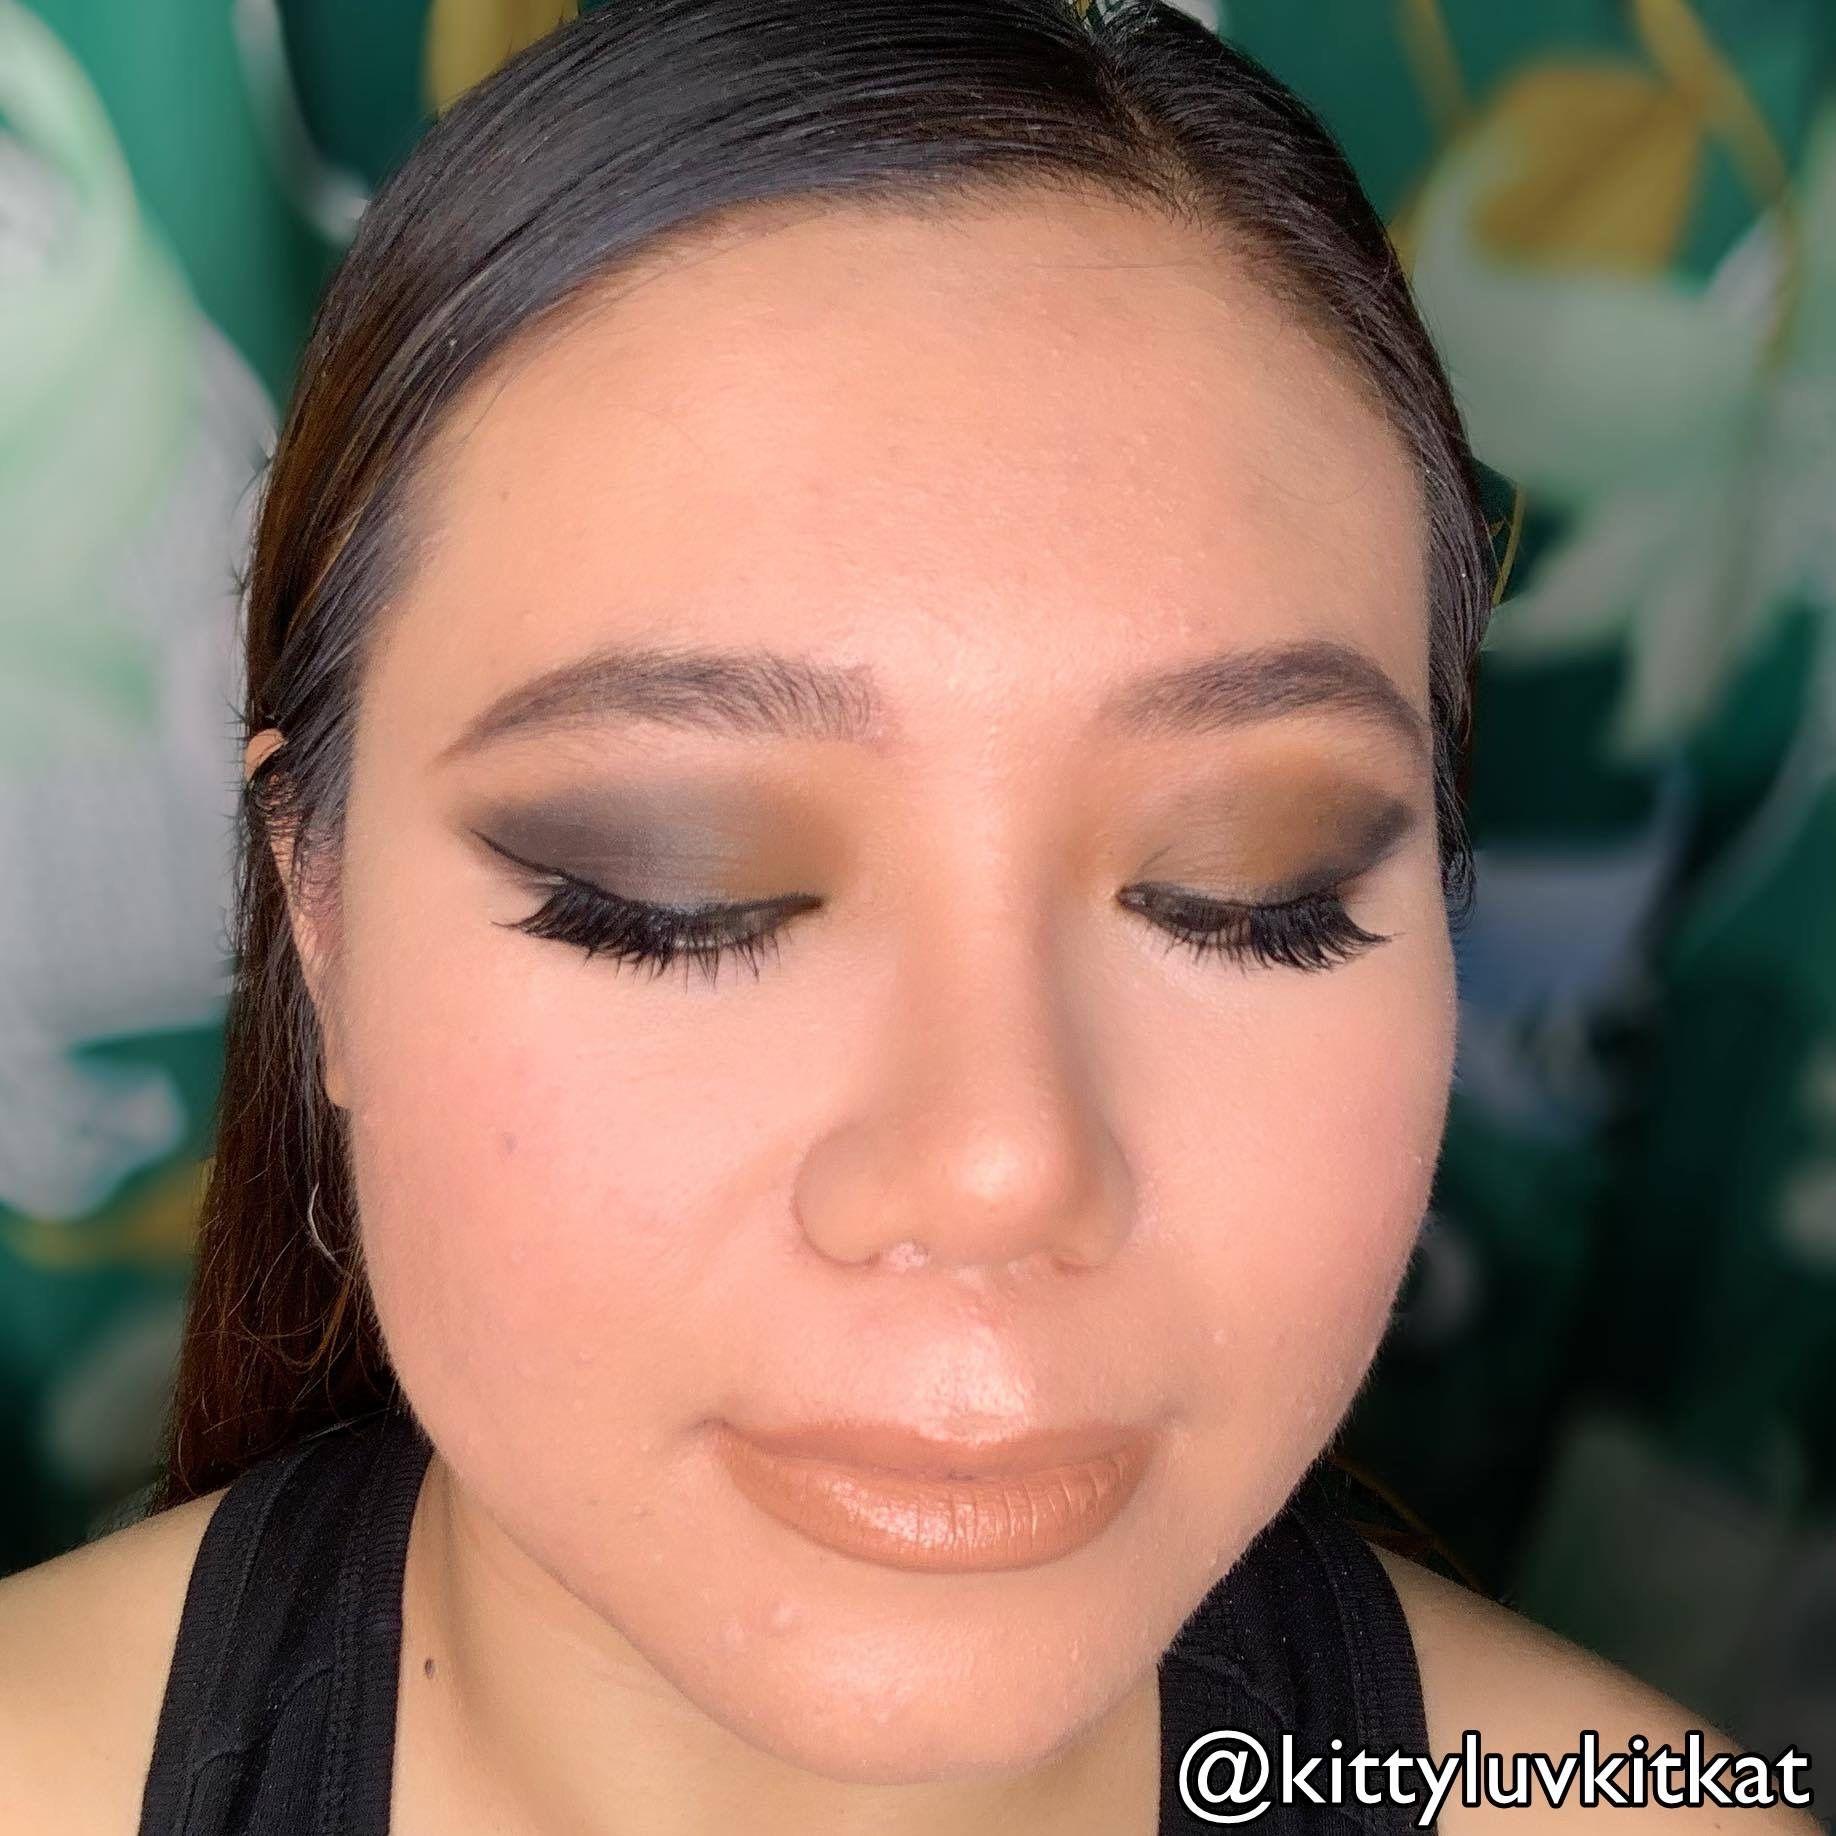 TiffanyD: Midnight Black Cat Eye Makeup Tutorial: Naked 2